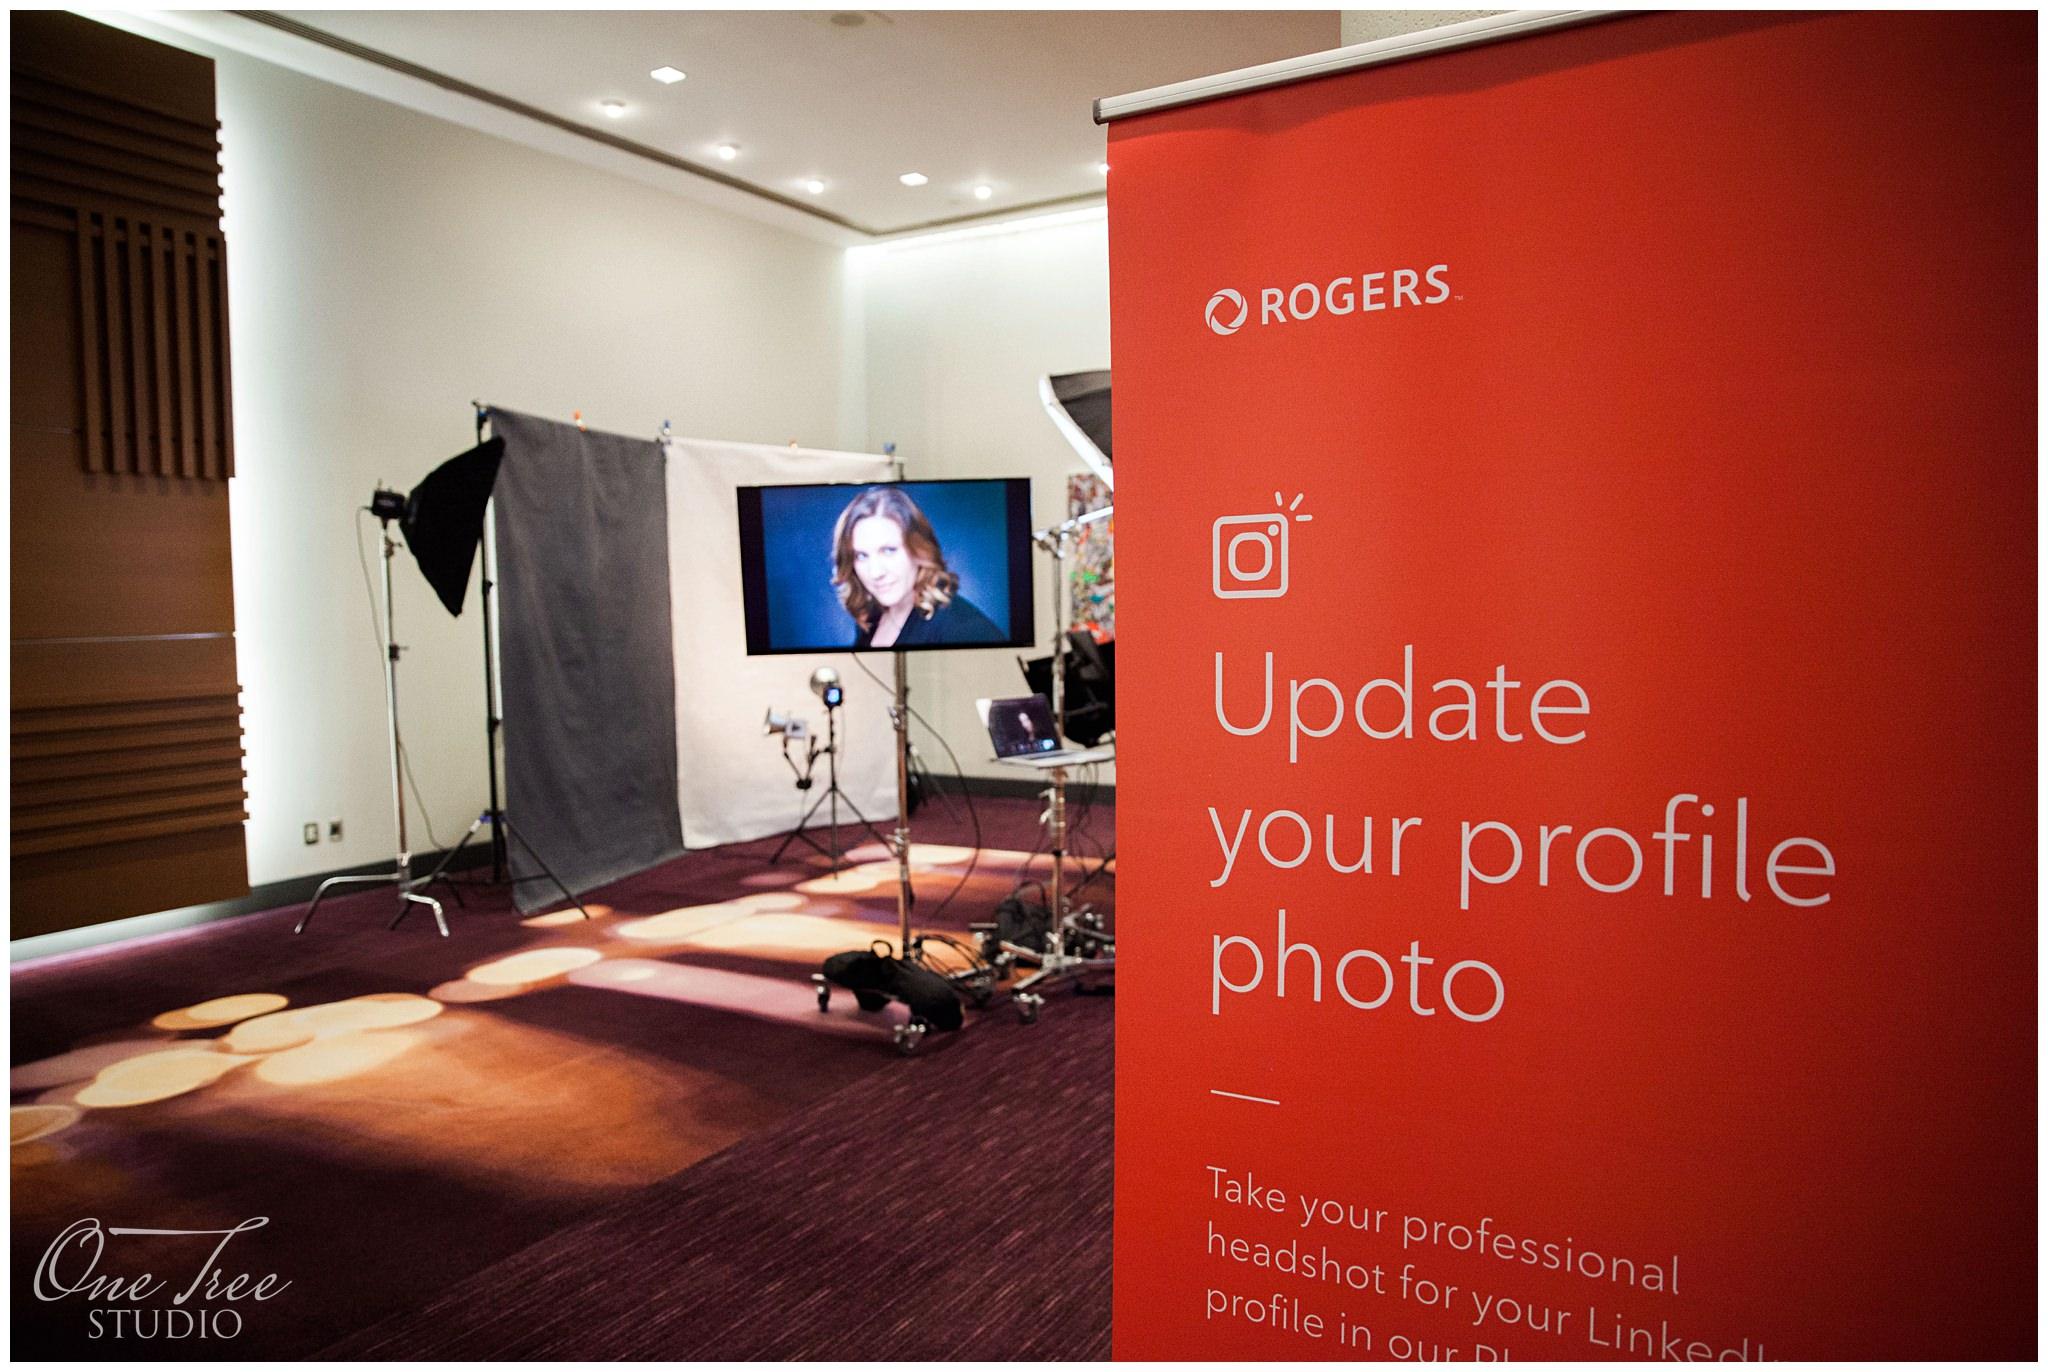 Toronto Corporate Event Photographer | One Tree Studio Inc.